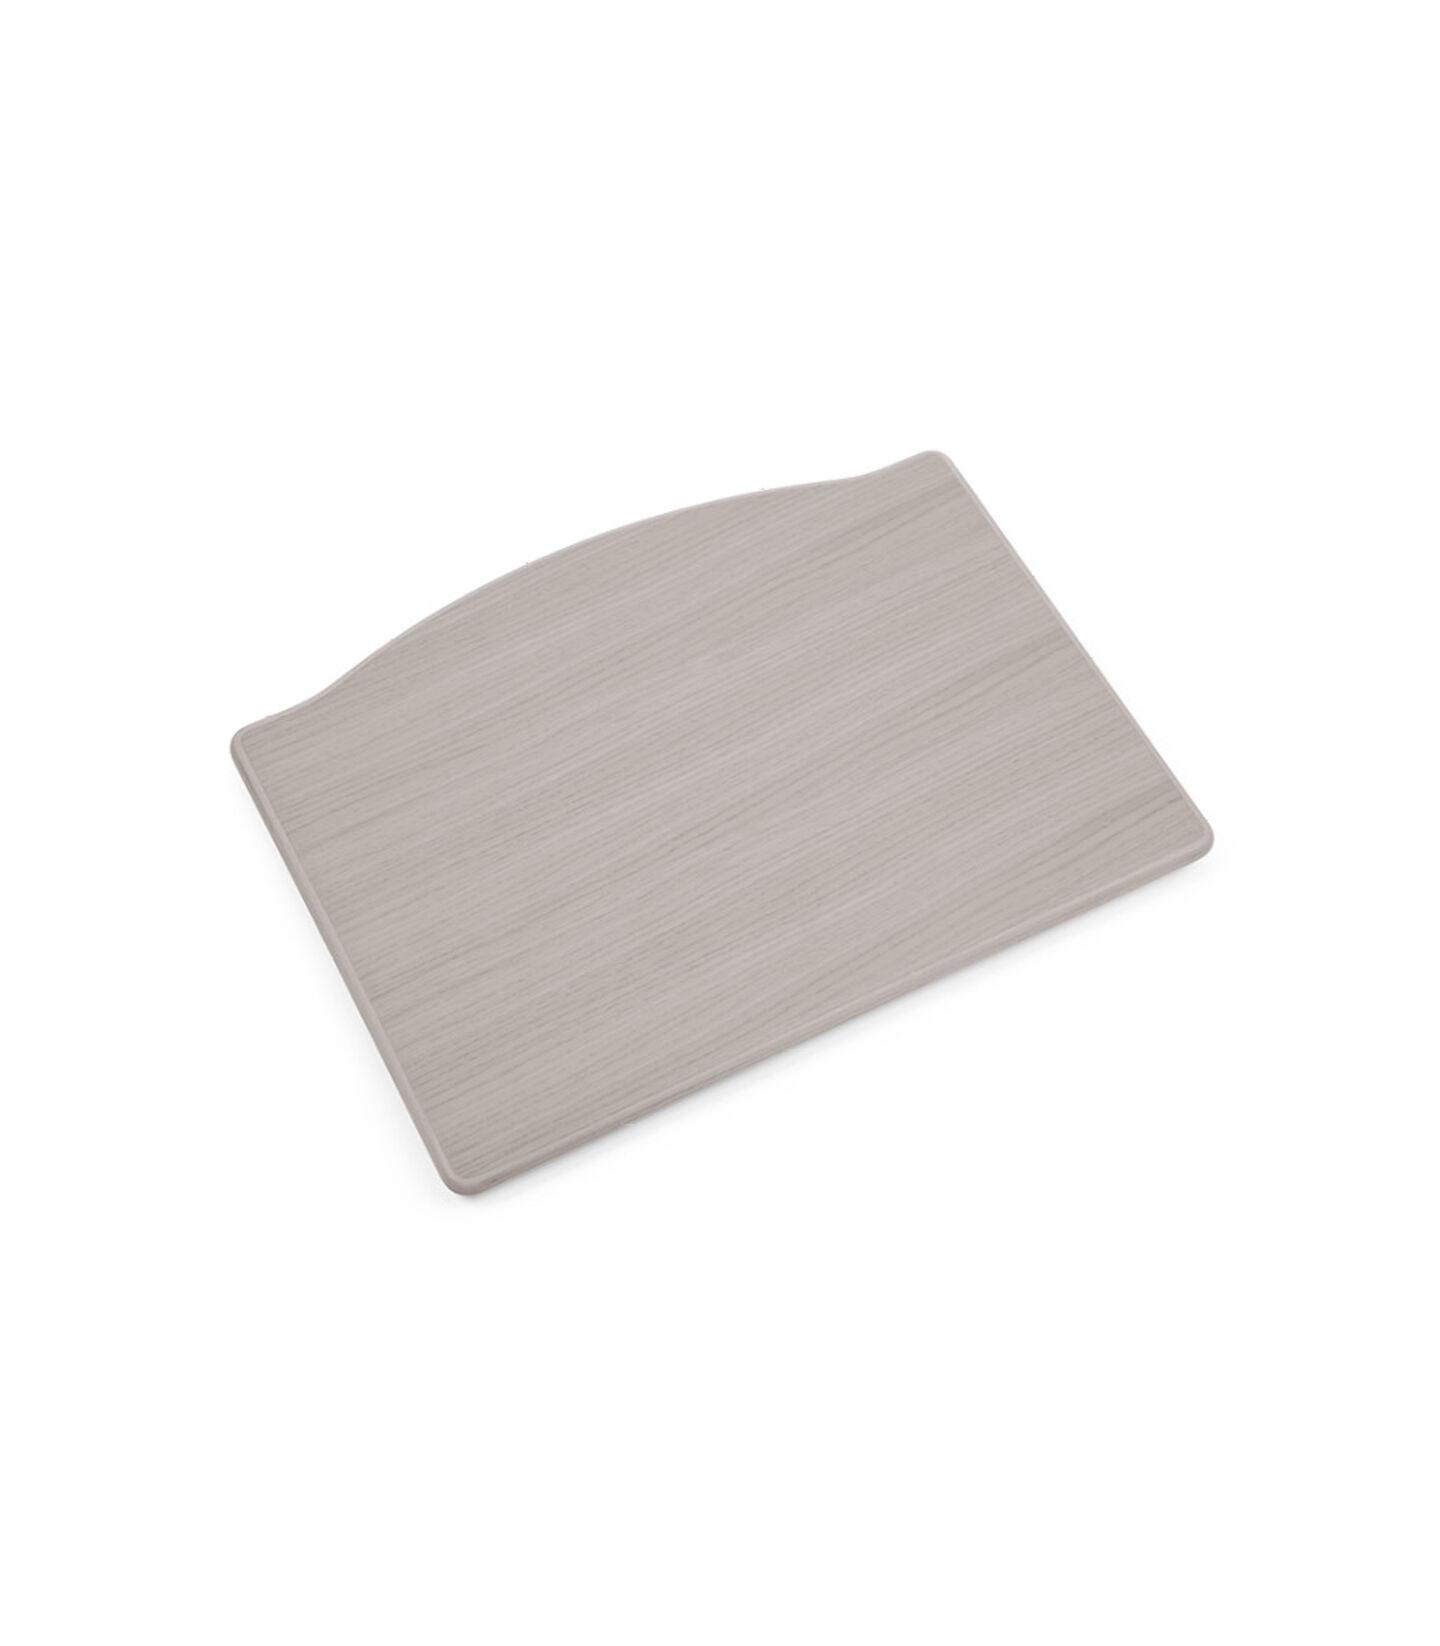 Tripp Trapp® Footplate Oak Greywash, Oak Greywash, mainview view 1